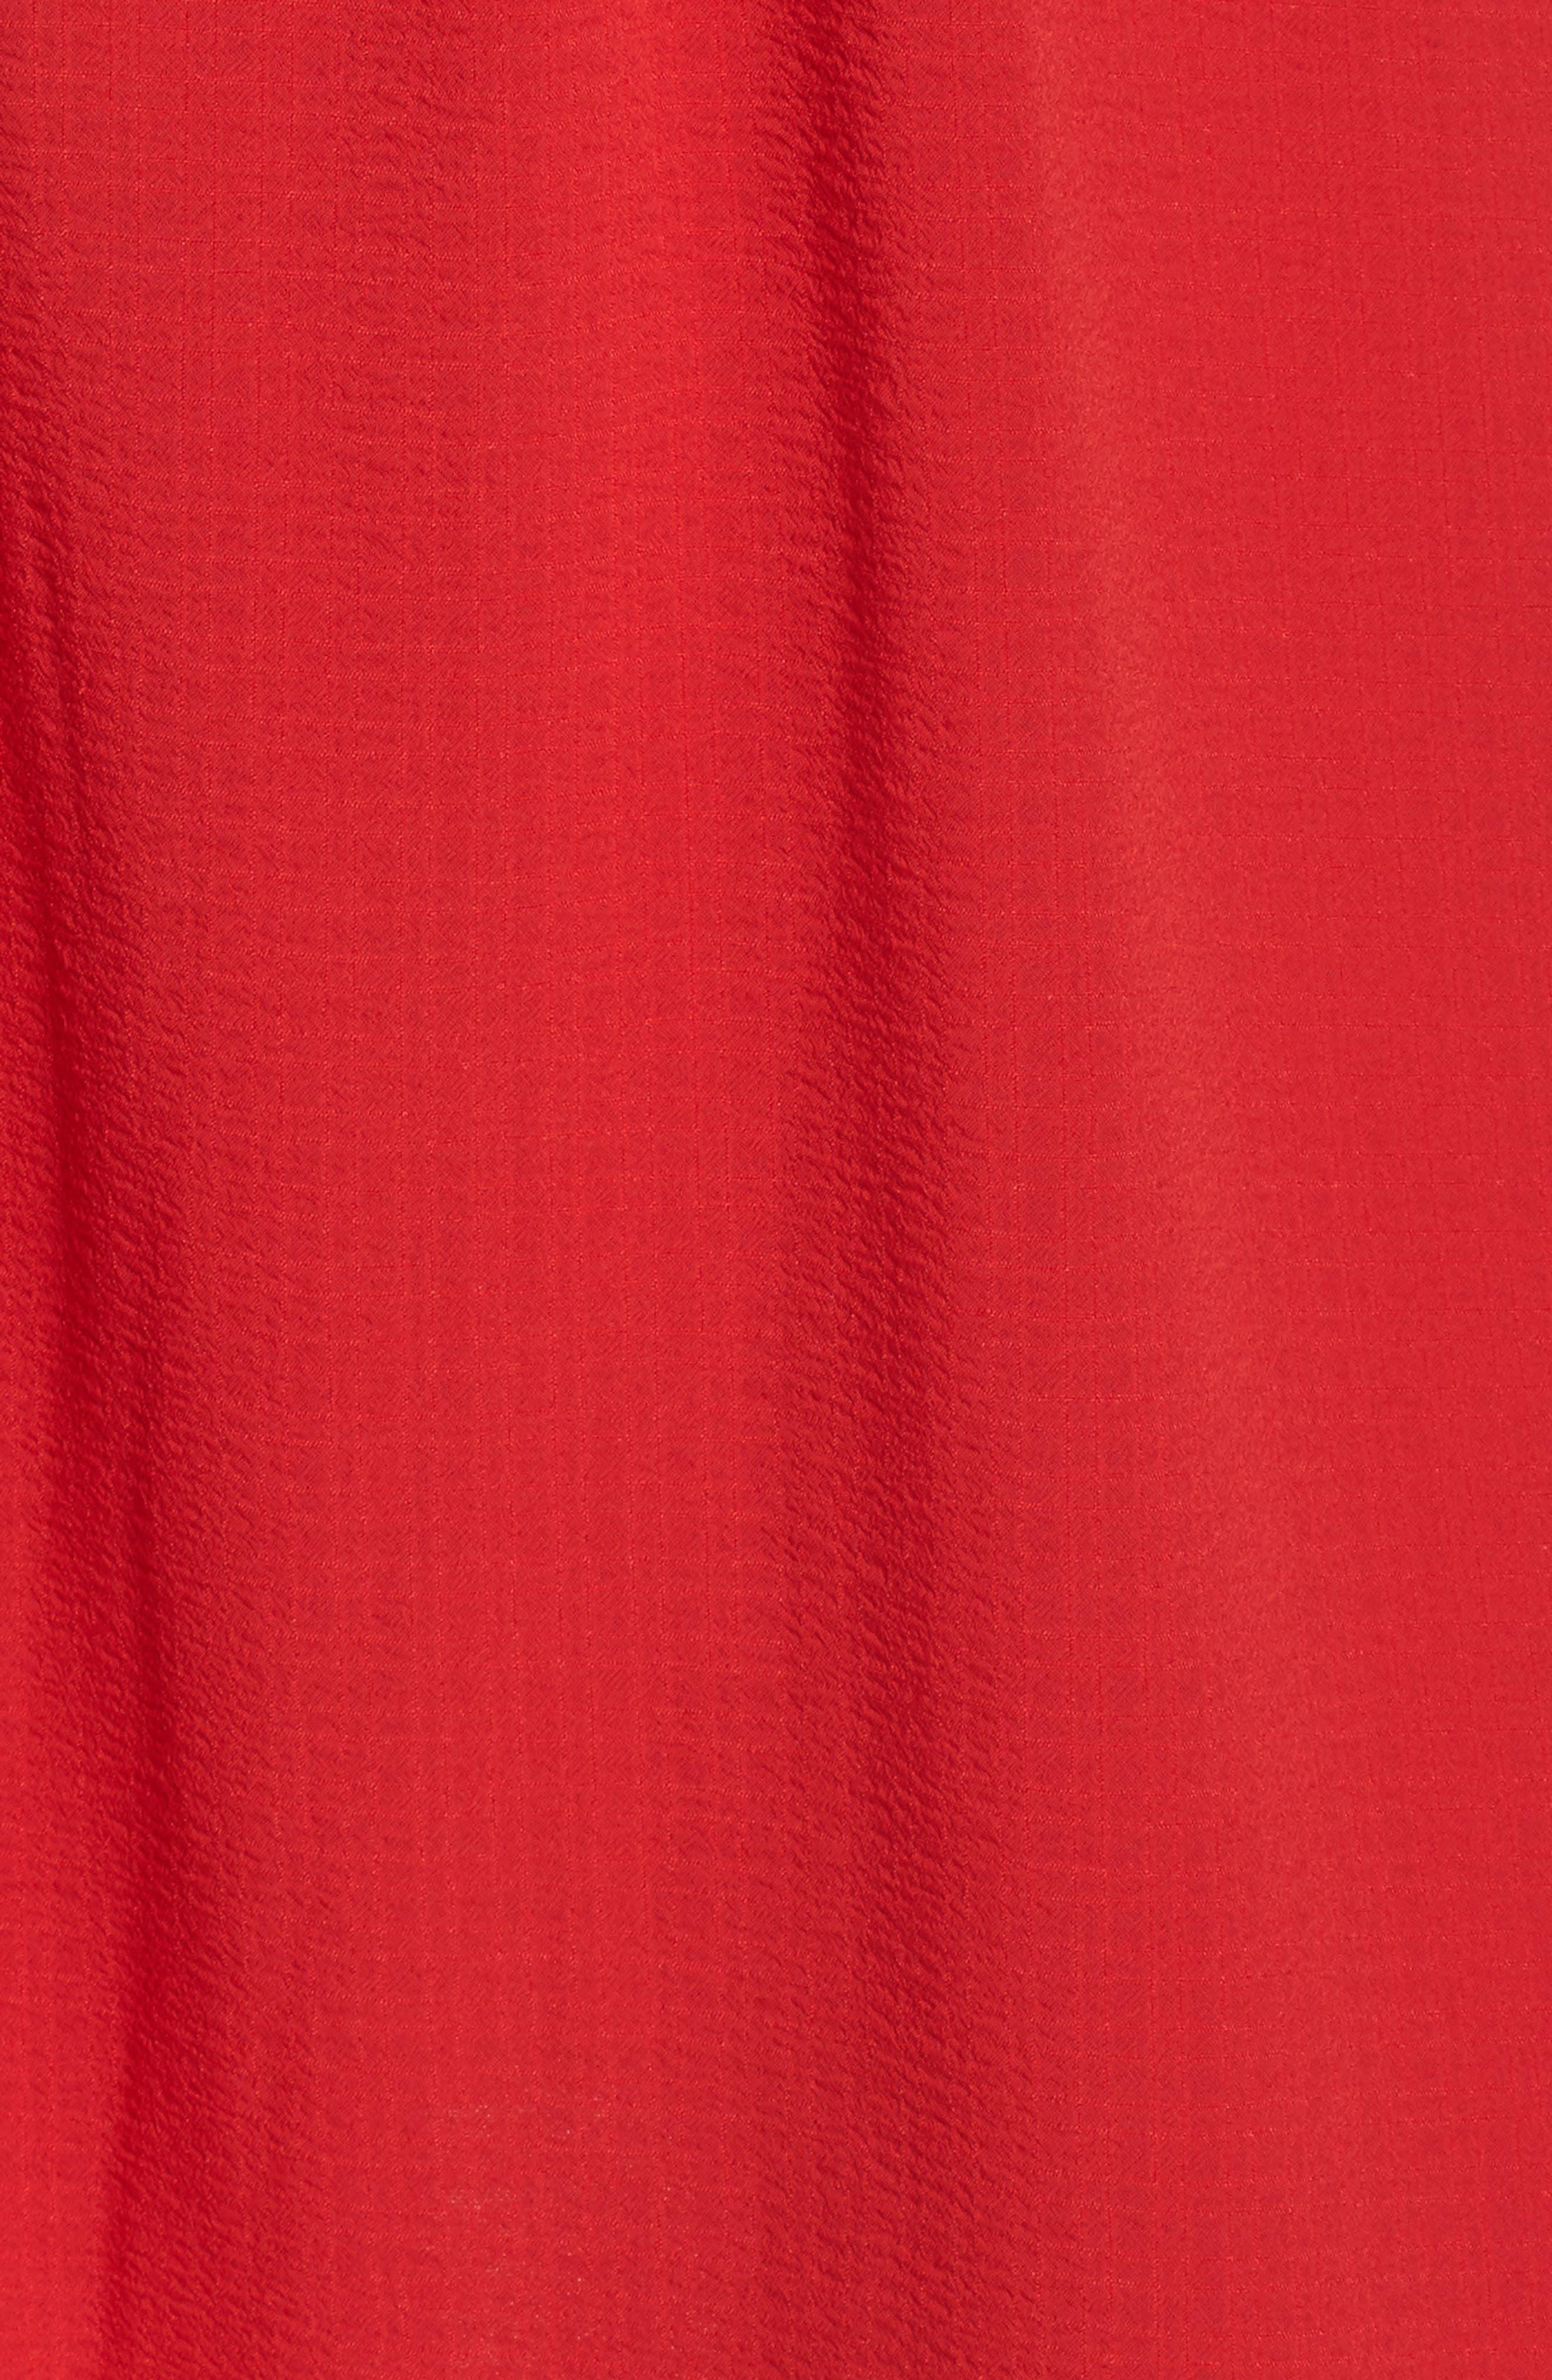 Ruffle Cold Shoulder Dress,                             Alternate thumbnail 5, color,